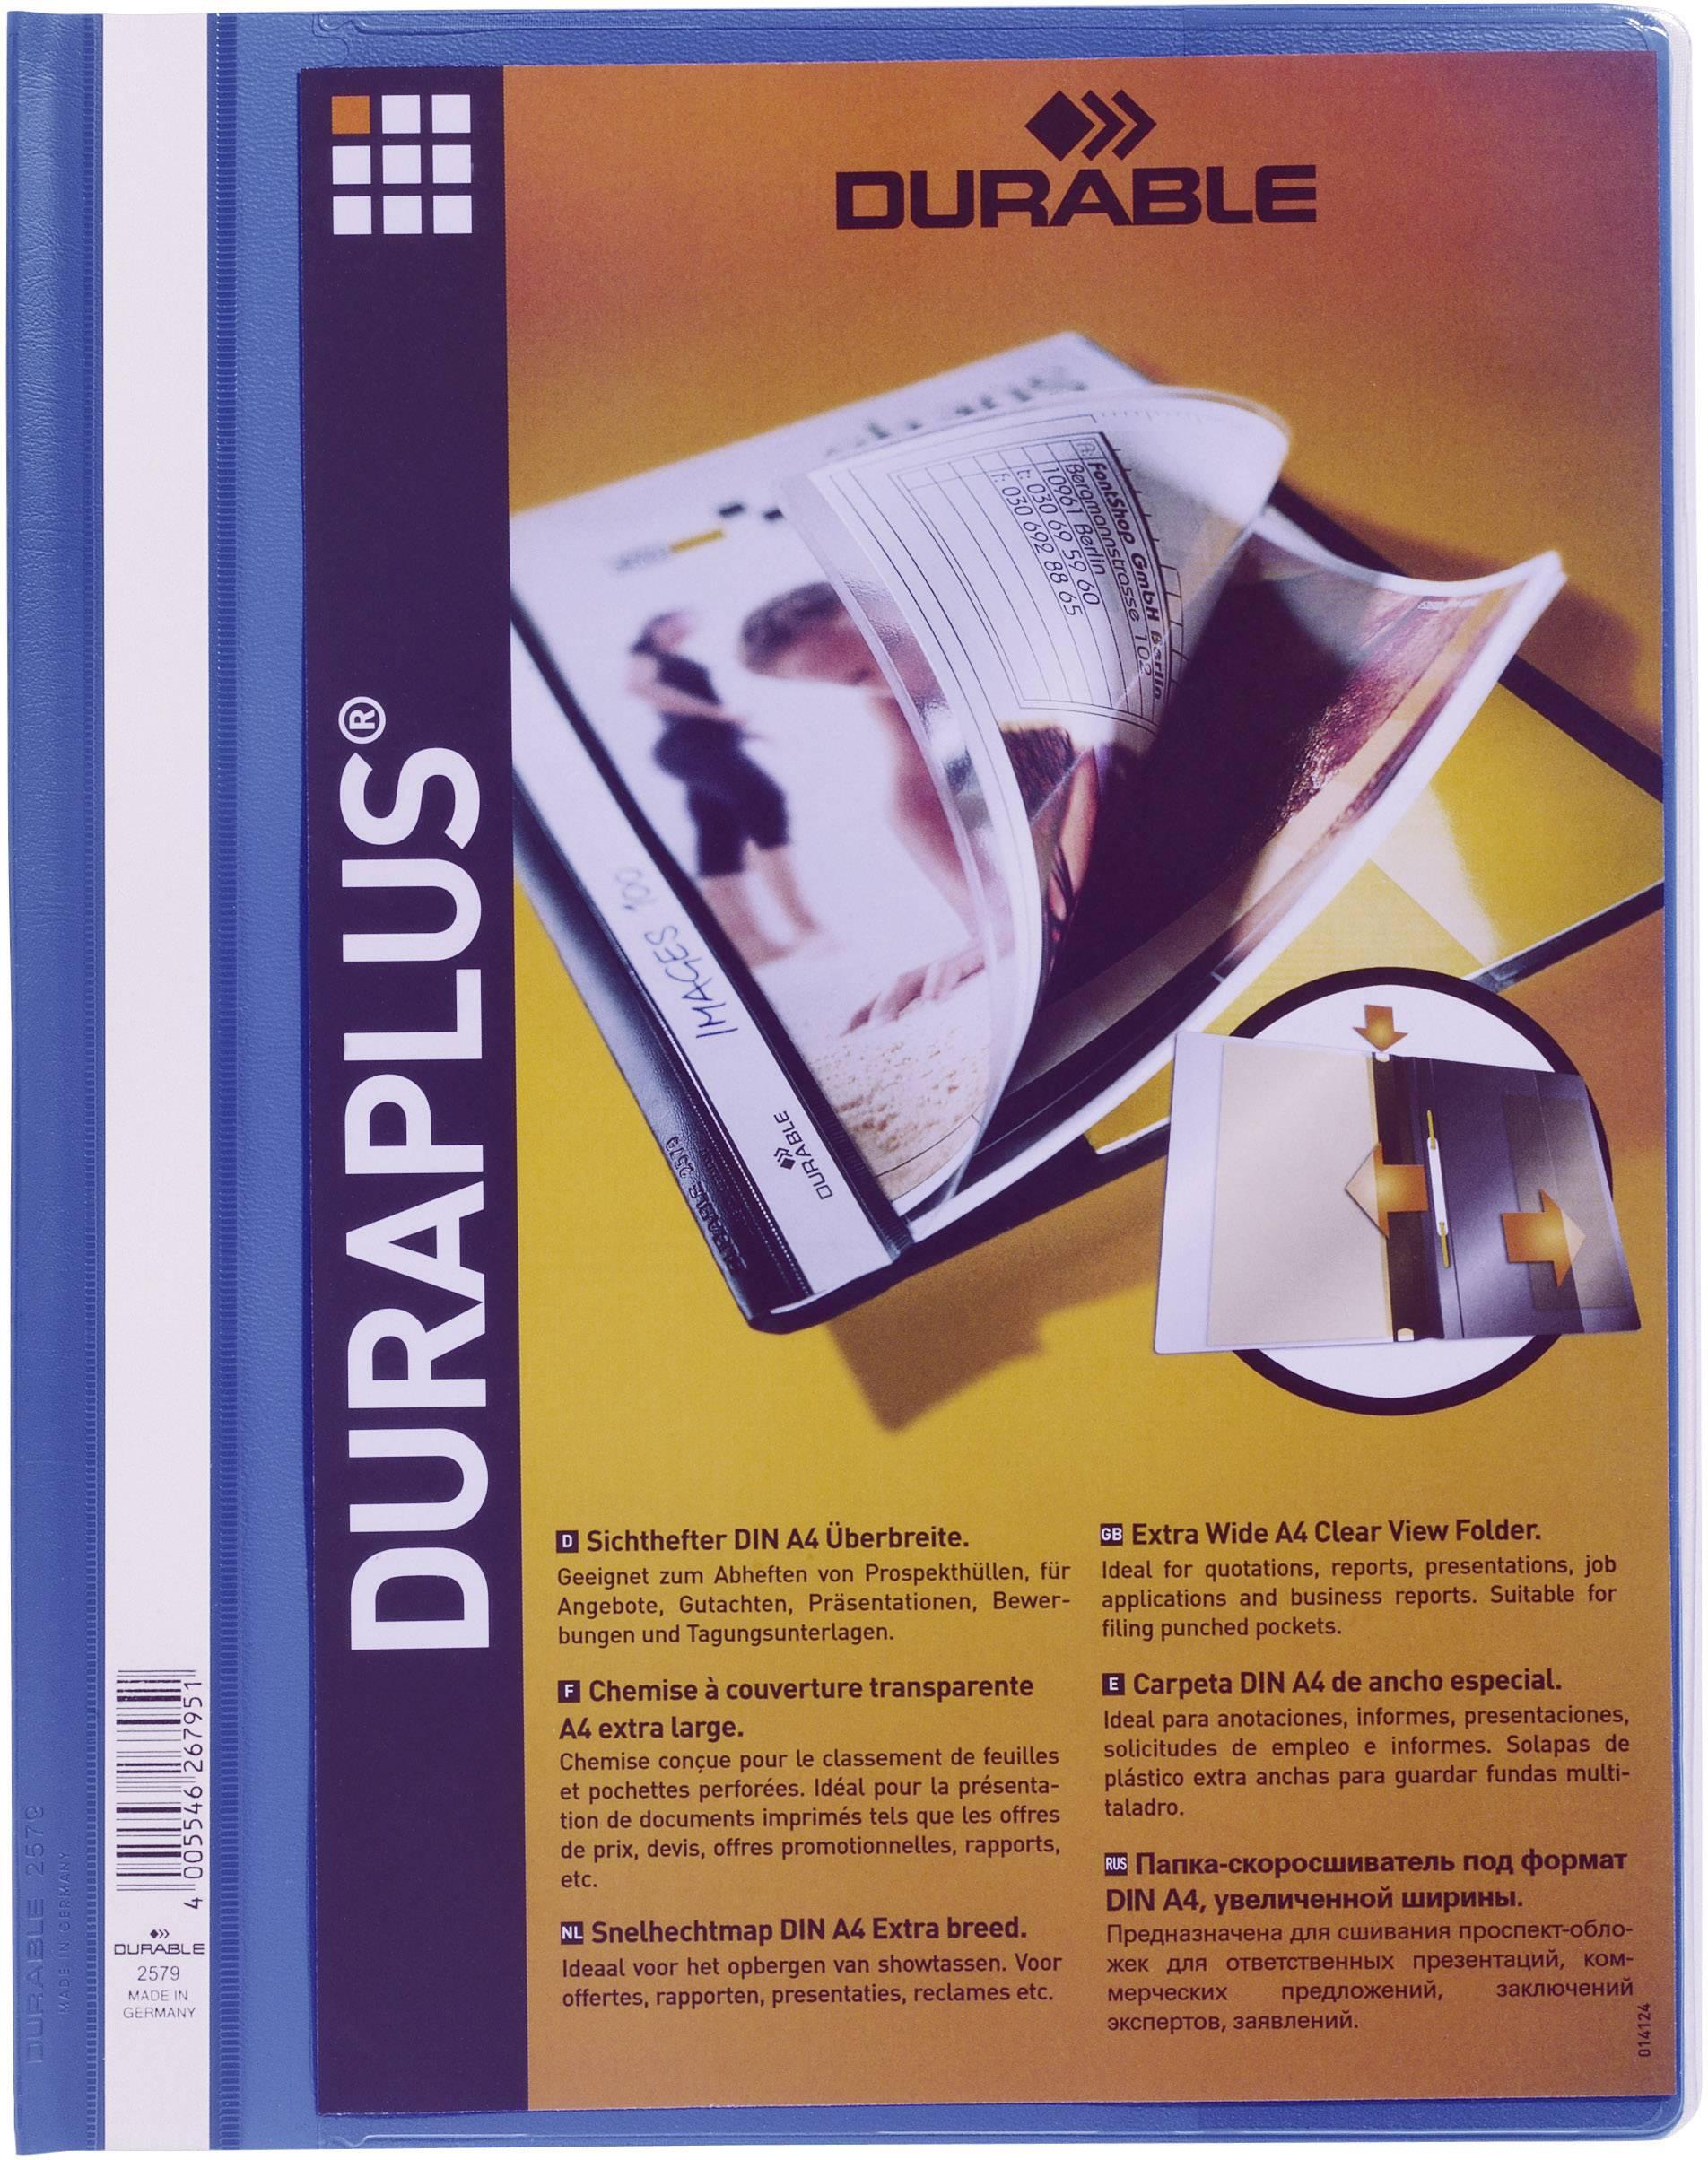 Mapa s sponko in s prozorno platnico Duraplus, modra 2579-06 Durable